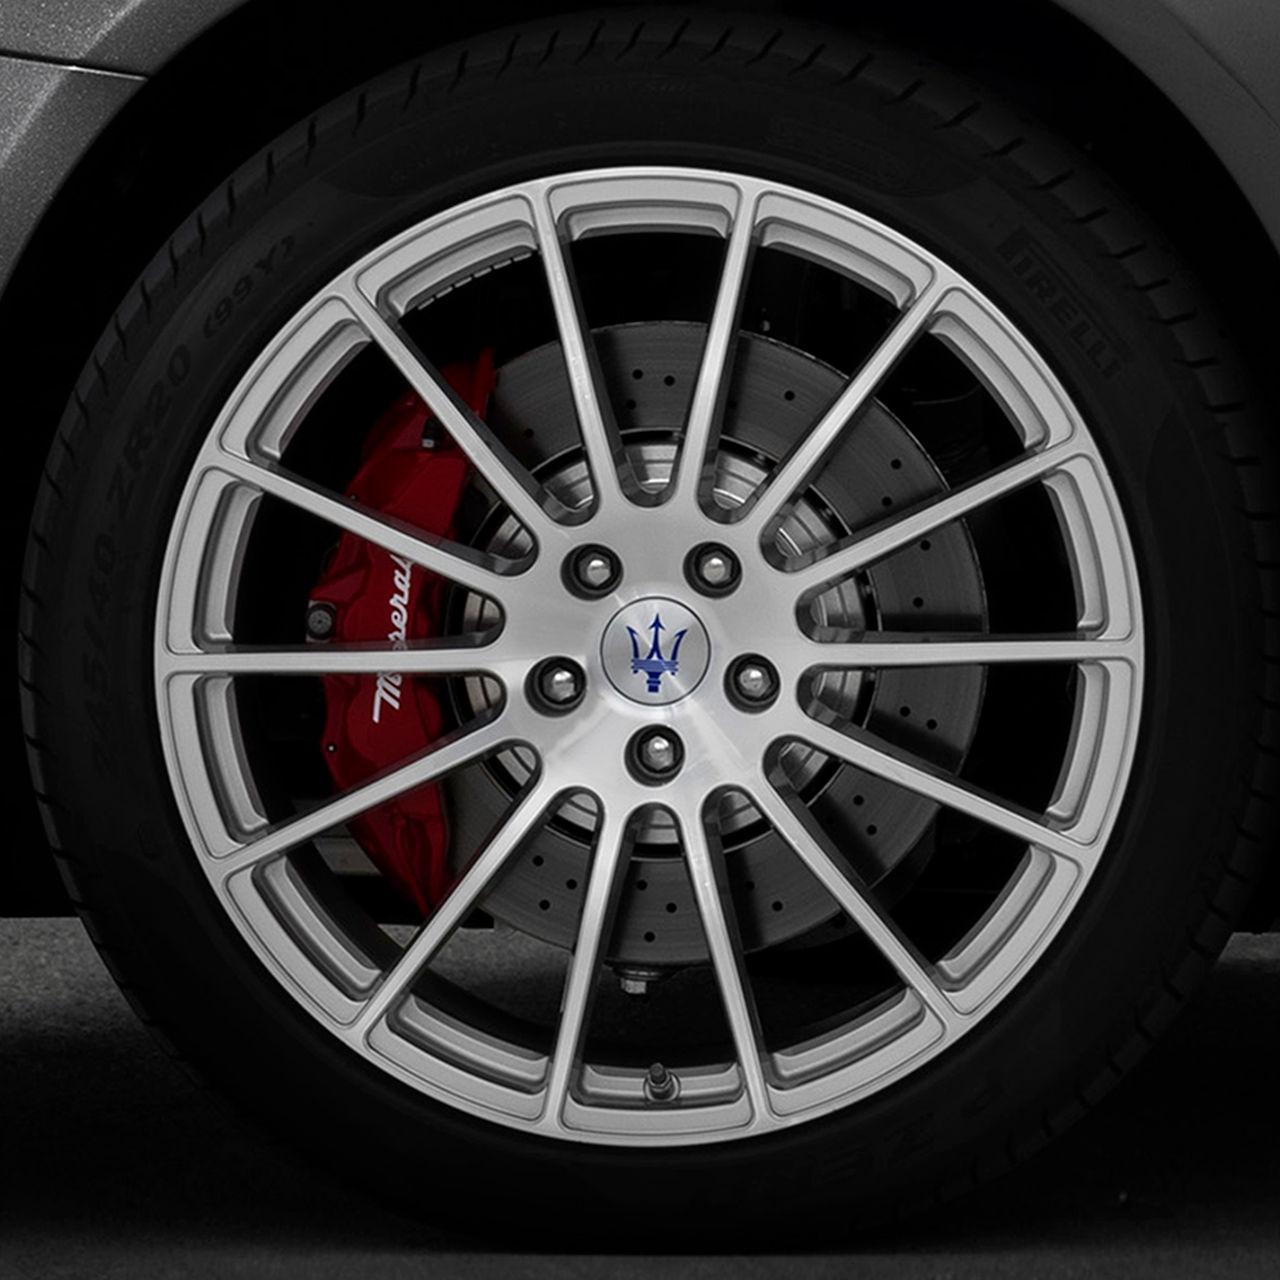 Maserati Quattroporte - Rad, Felge und Reifen Detail